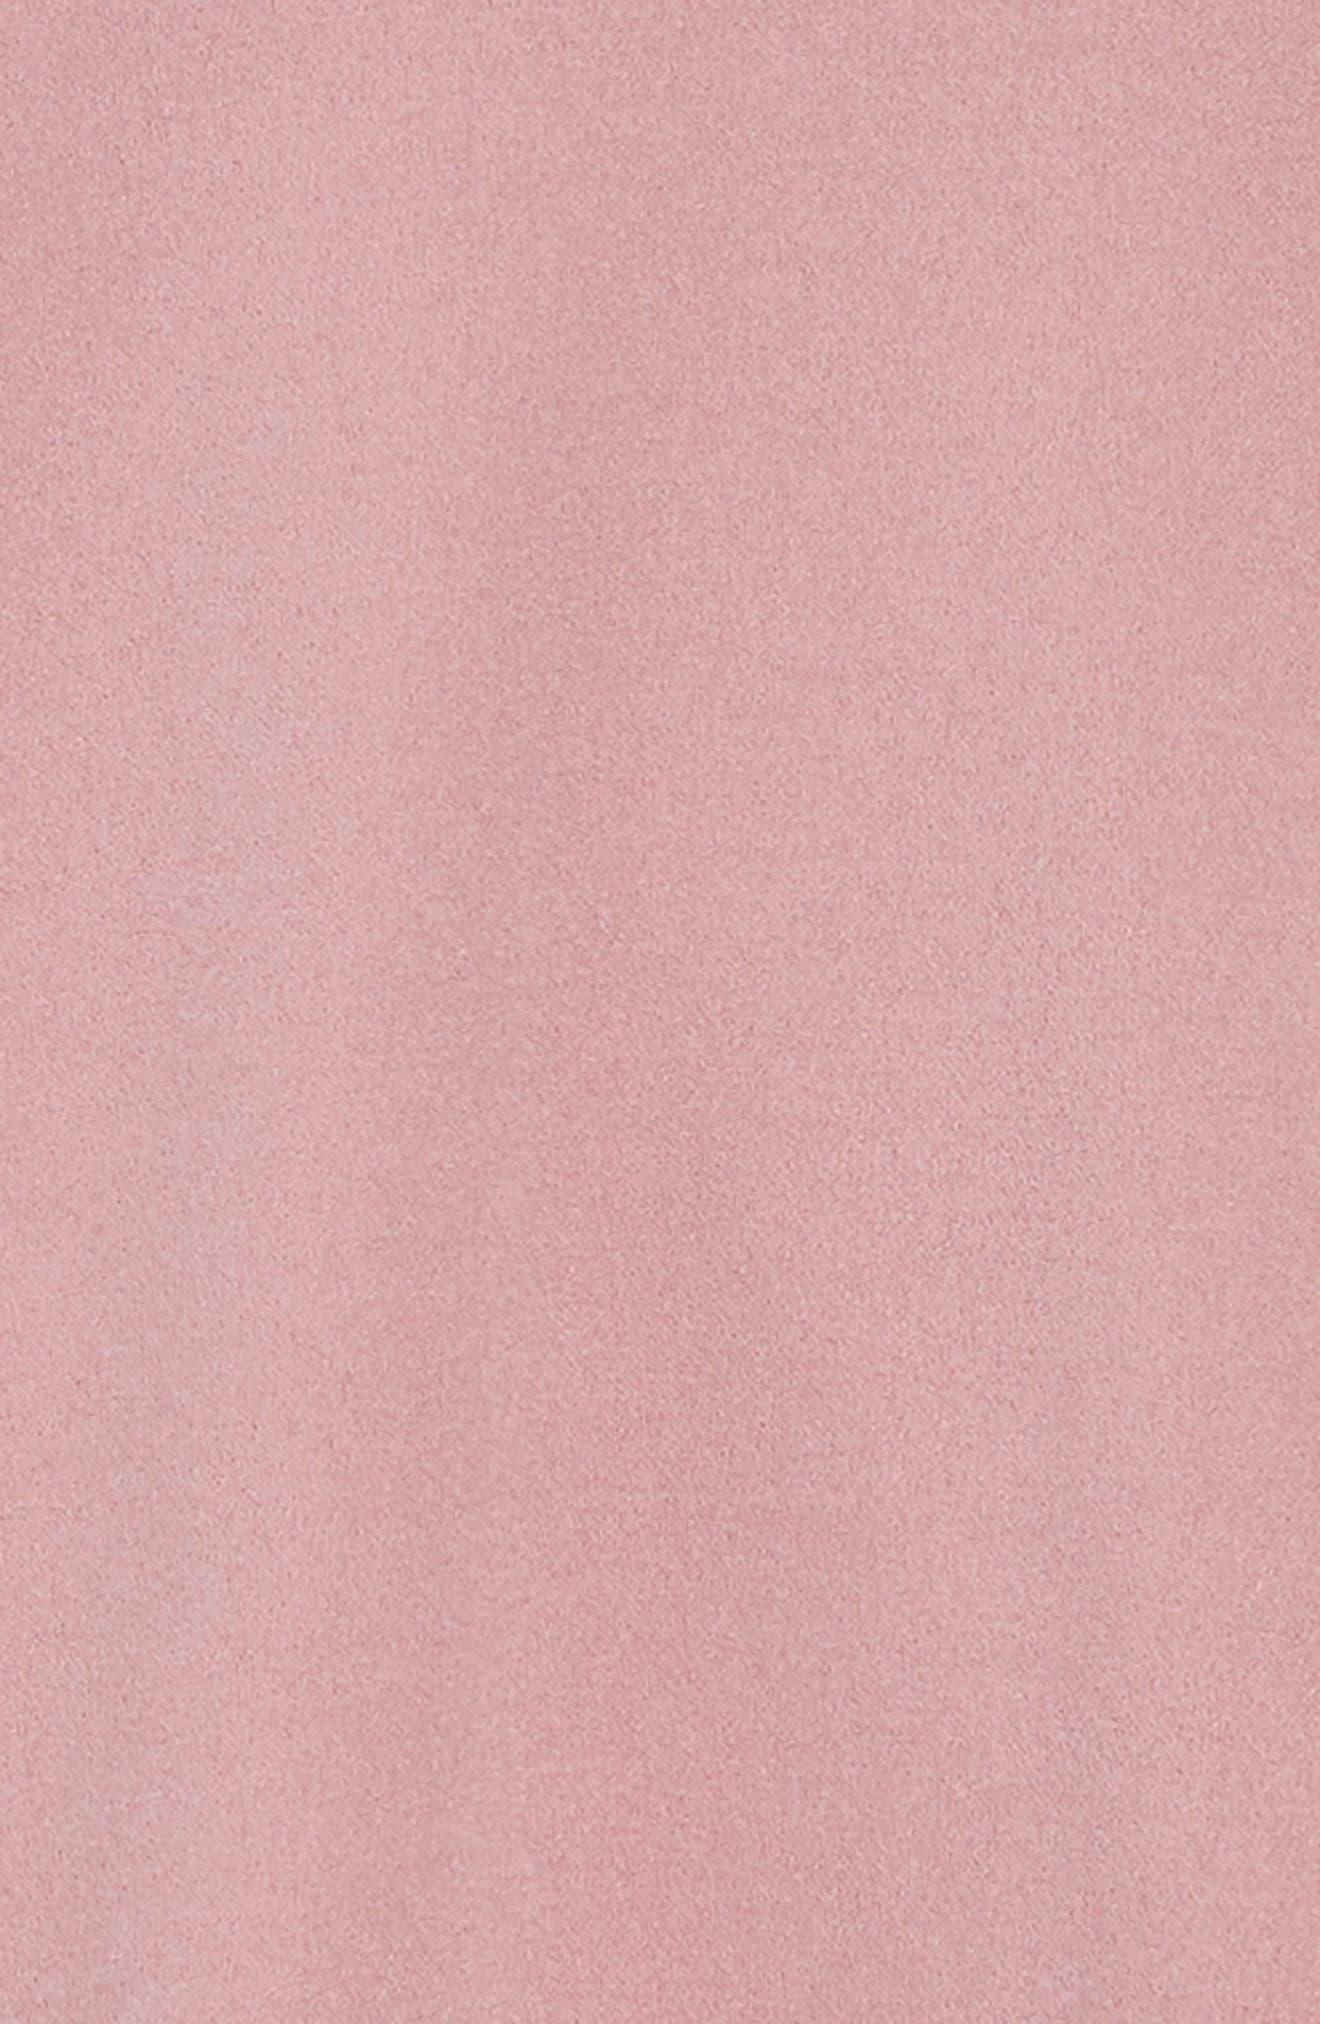 Mesh Cutout Fit & Flare Dress,                             Alternate thumbnail 3, color,                             ROSE